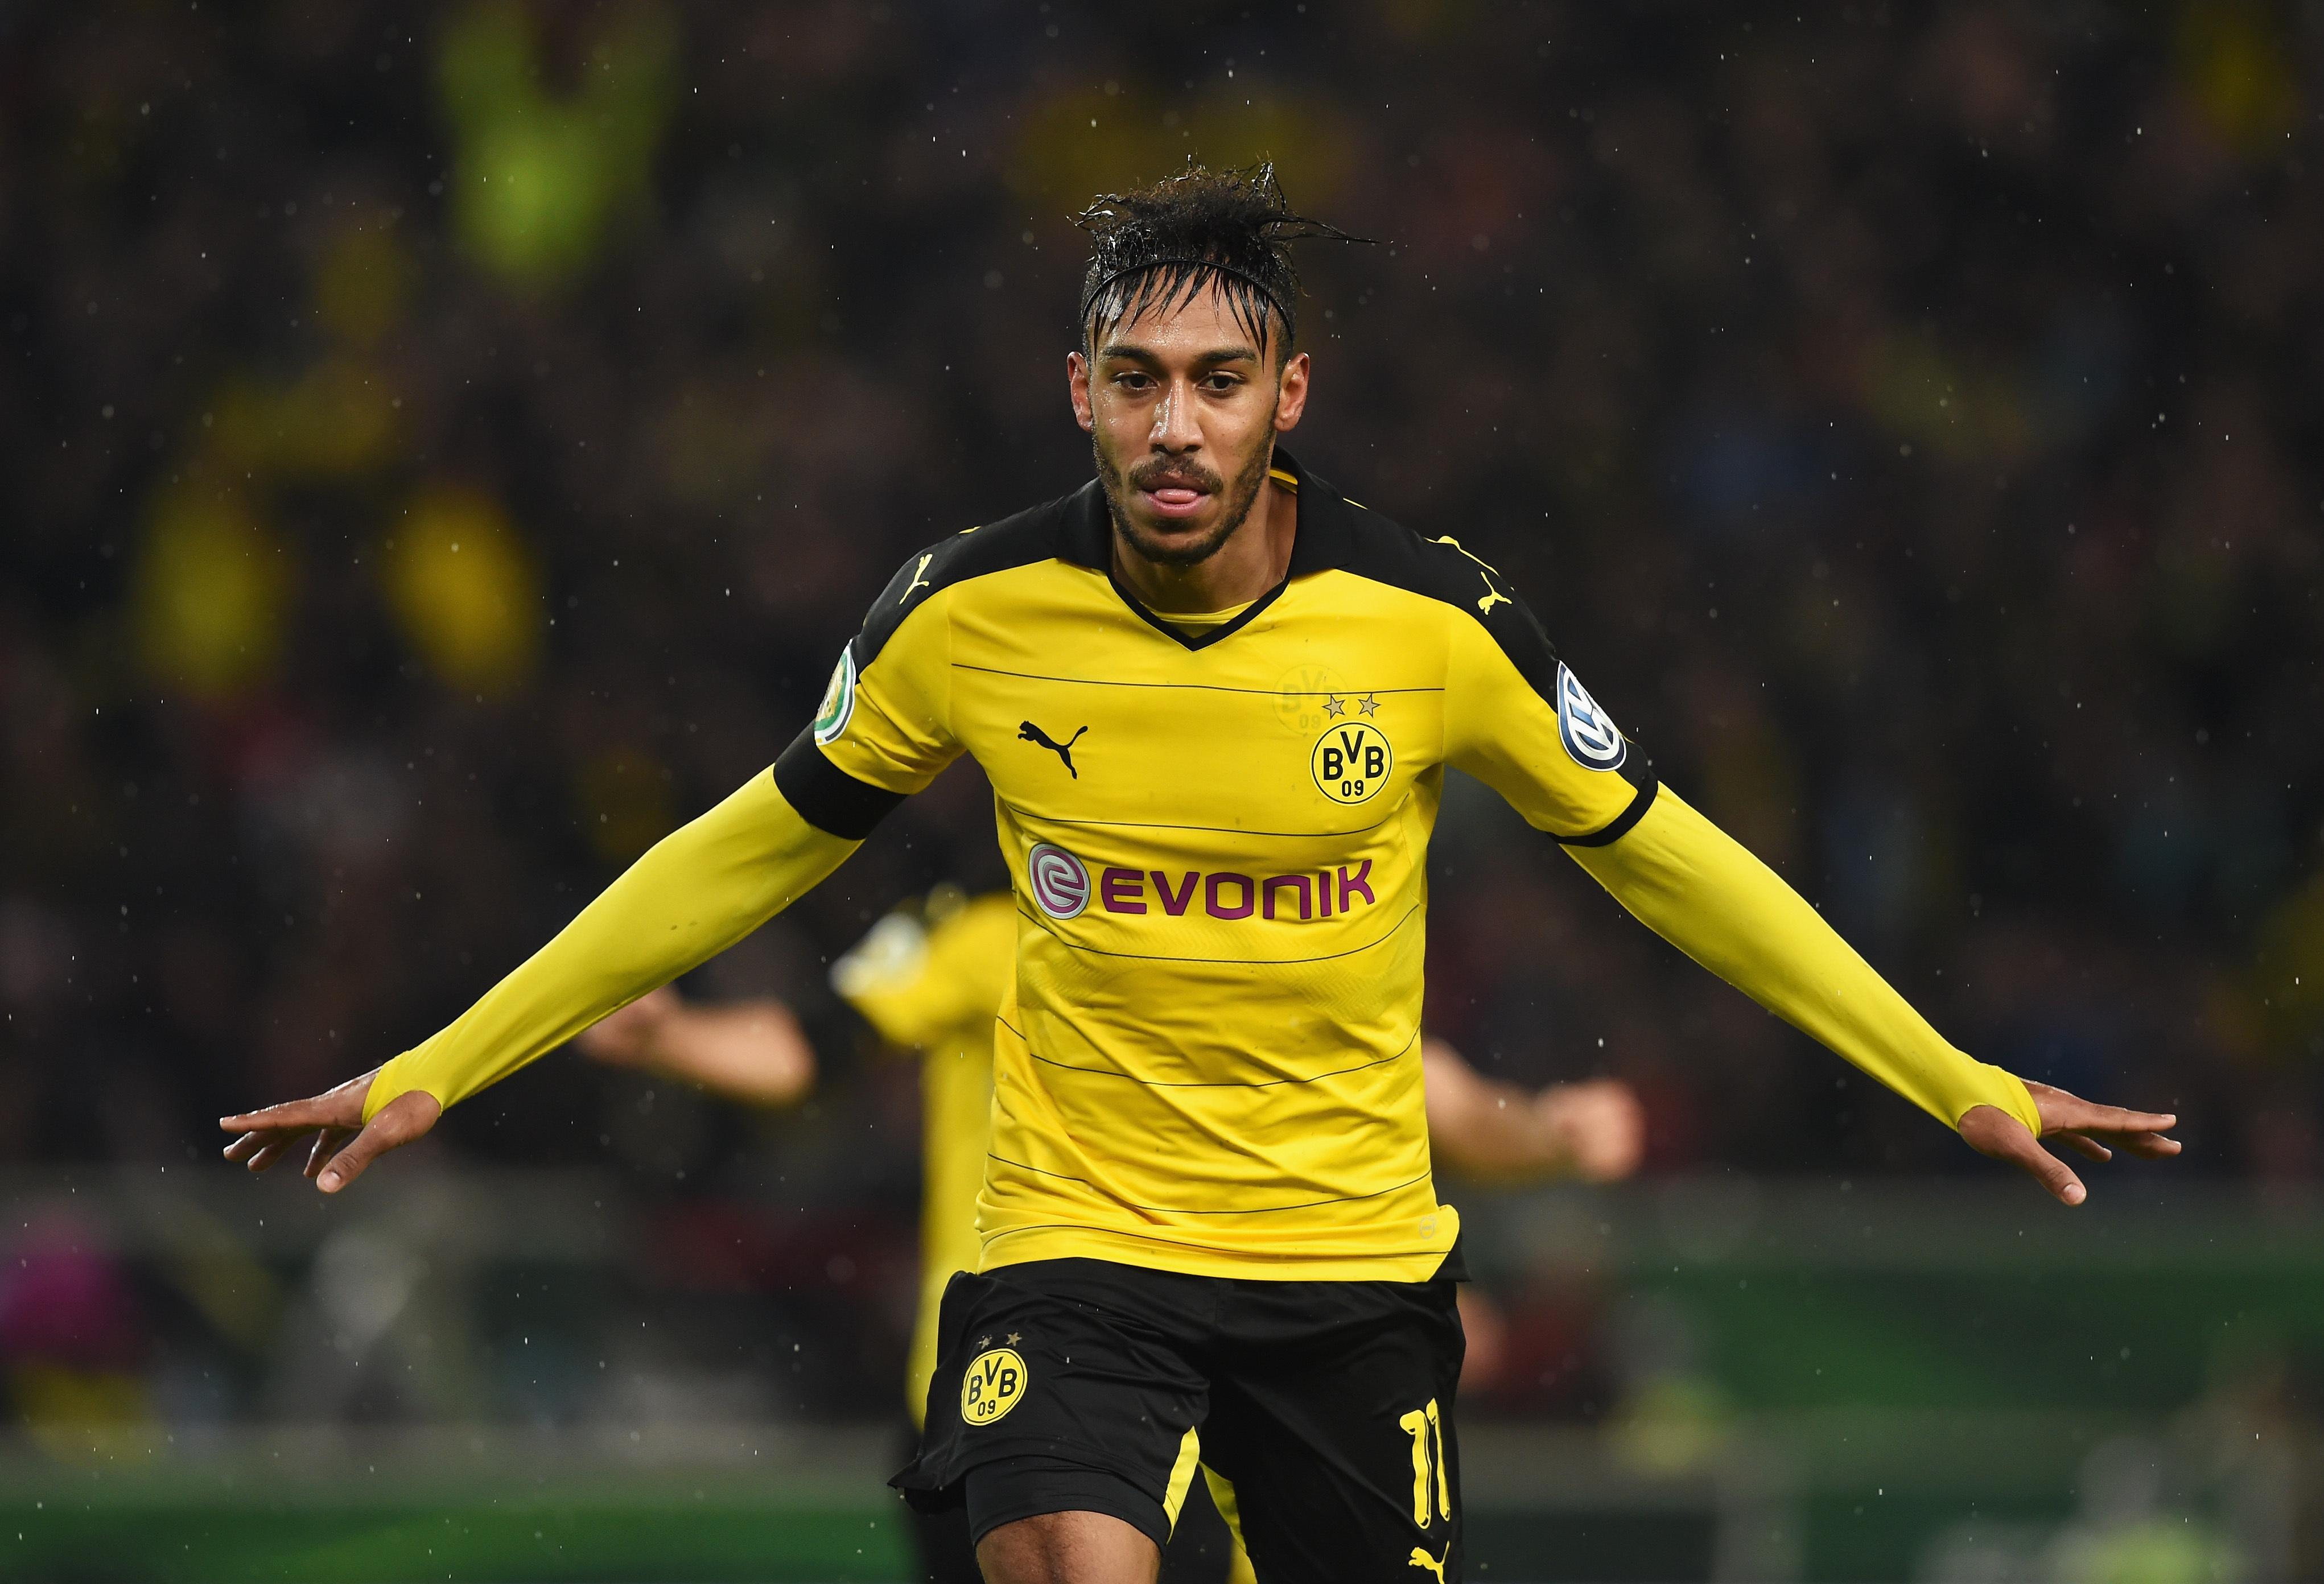 Borussia Dortmund Wallpapers Football Player Number 24 4084x2784 Wallpaper Teahub Io